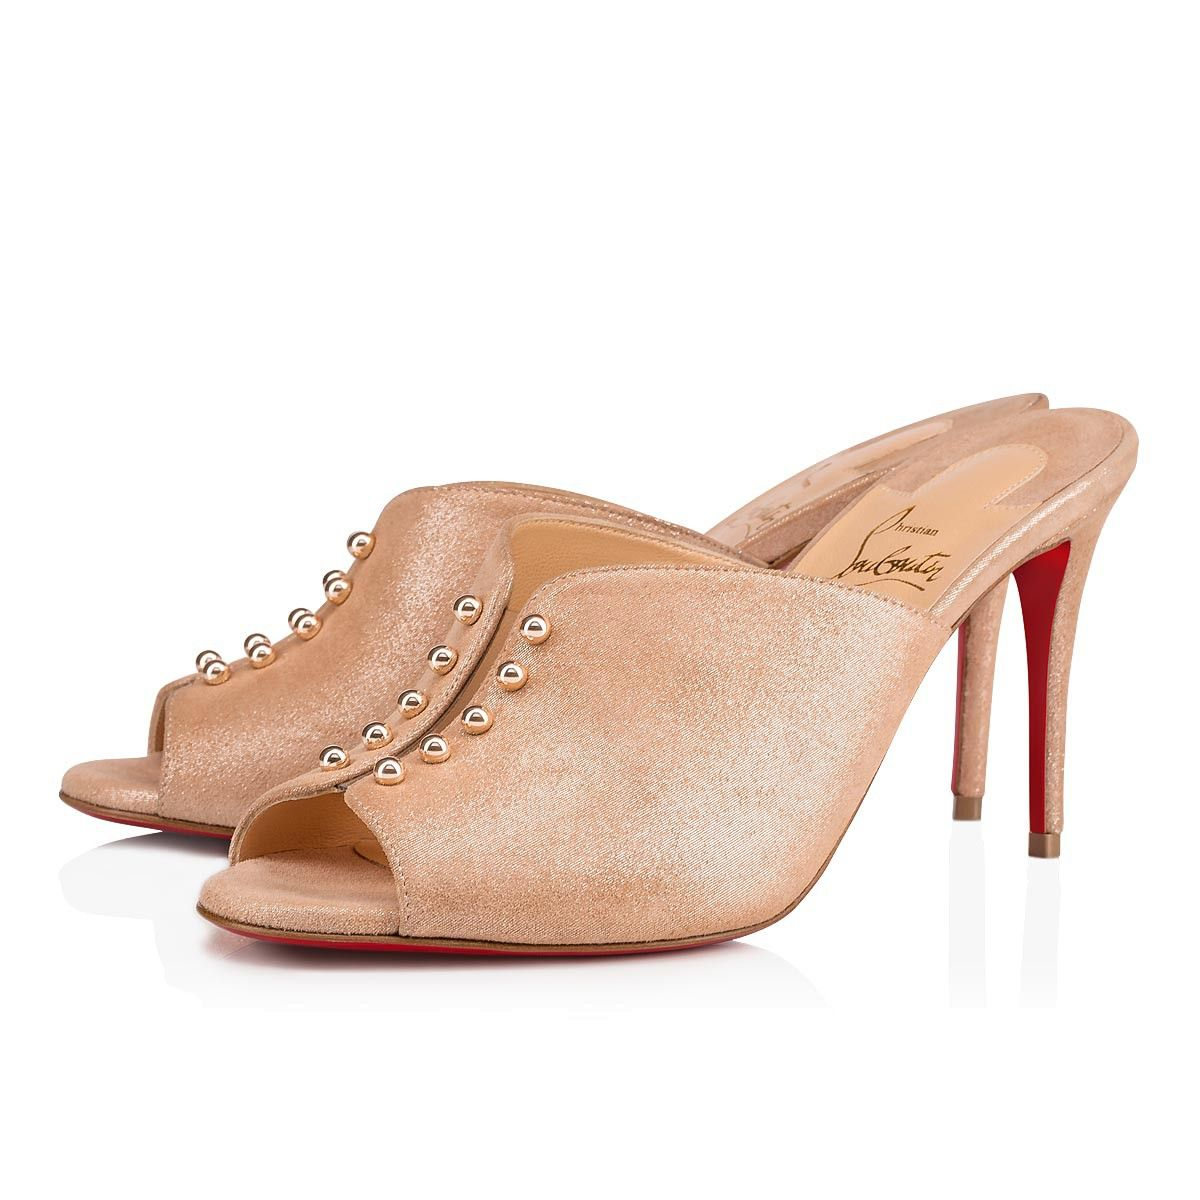 8740419a7fa5 CHRISTIAN LOUBOUTIN Predumule.  christianlouboutin  shoes ...